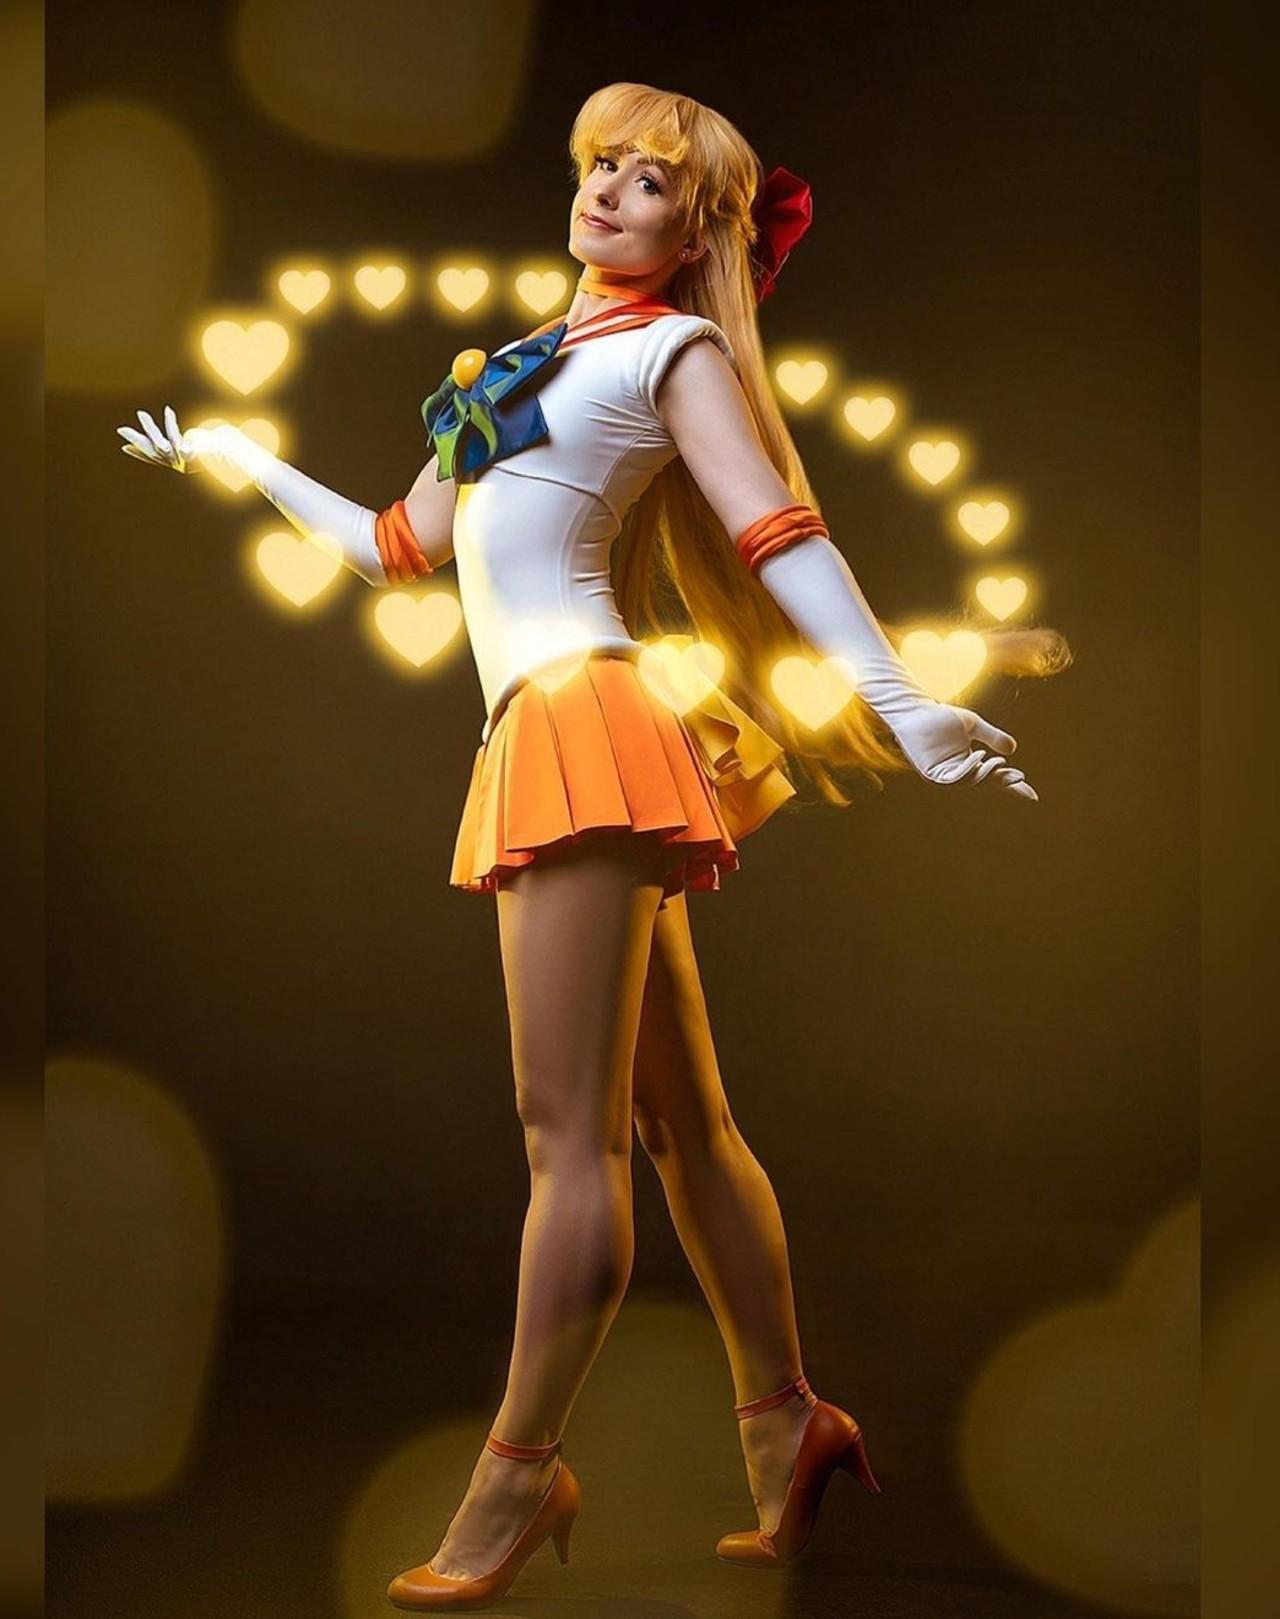 Sailor Moon: Chica le da vida Sailor Venus con un cosplay fabuloso